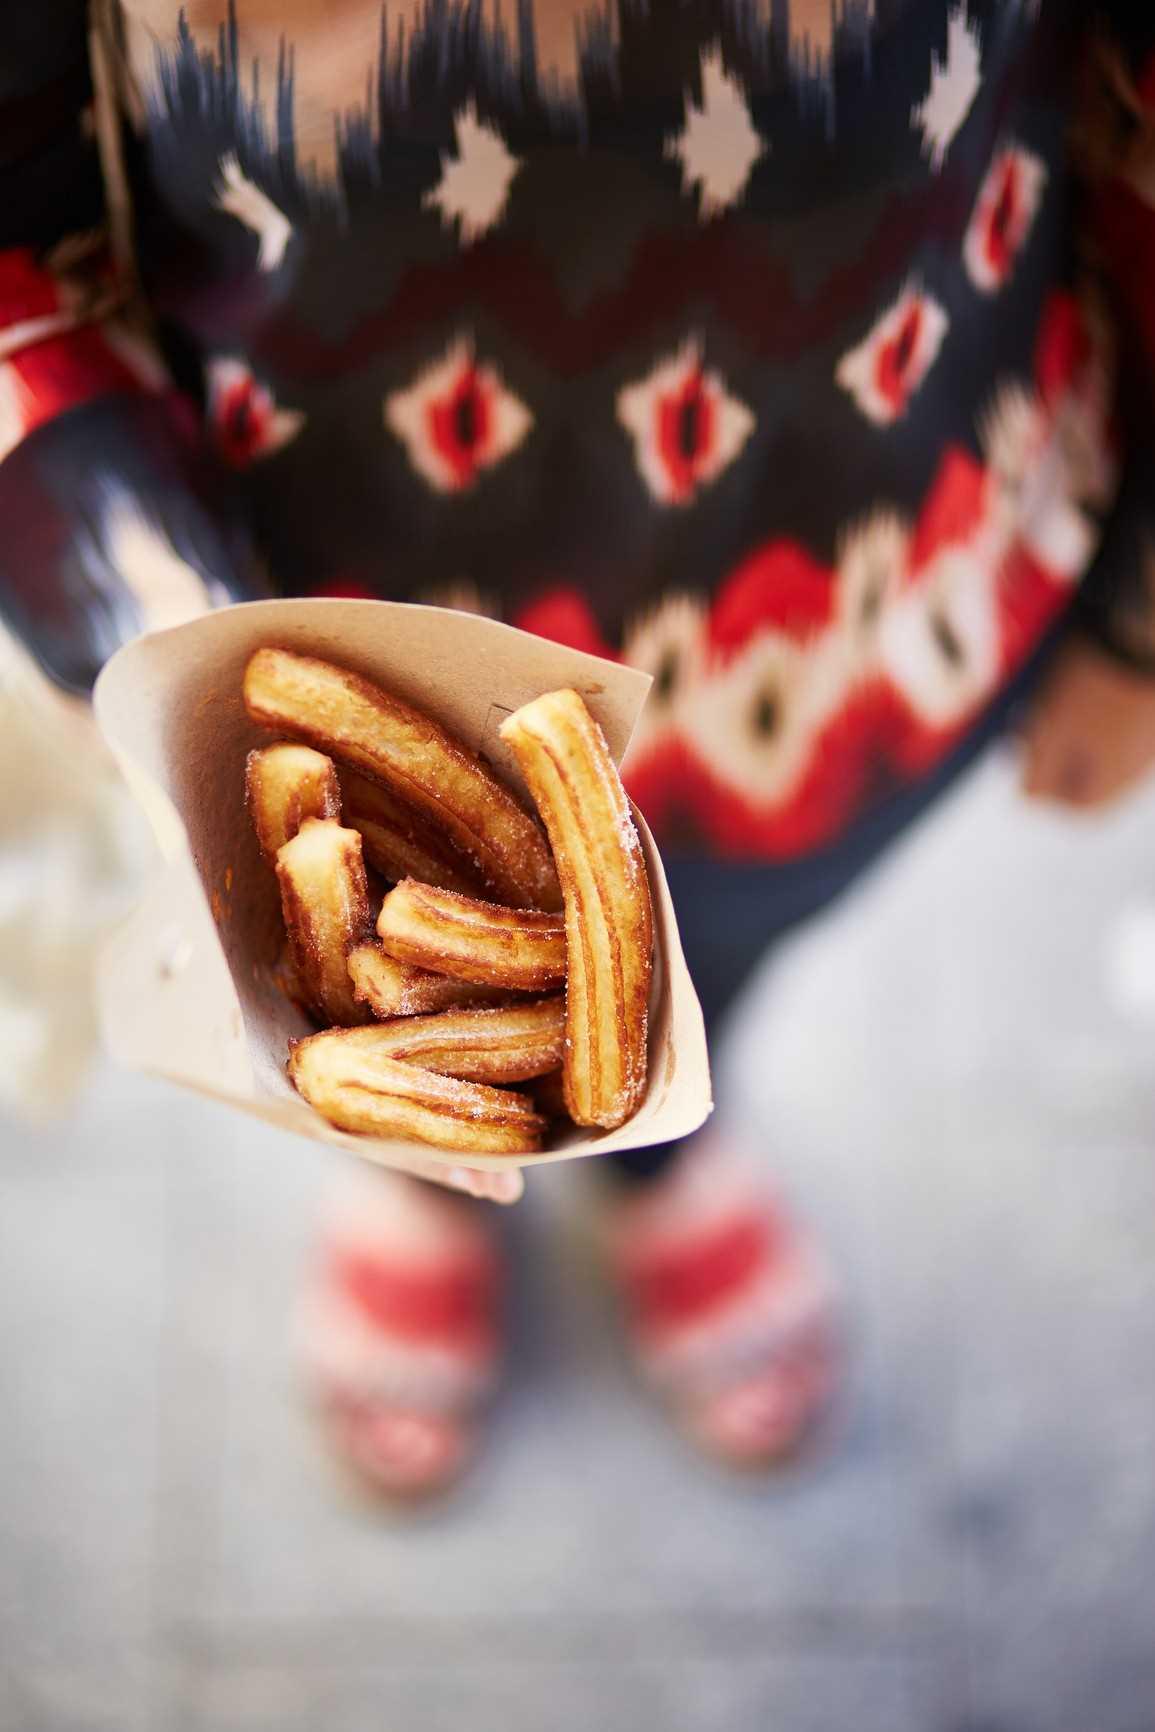 Who doesn't love churros?